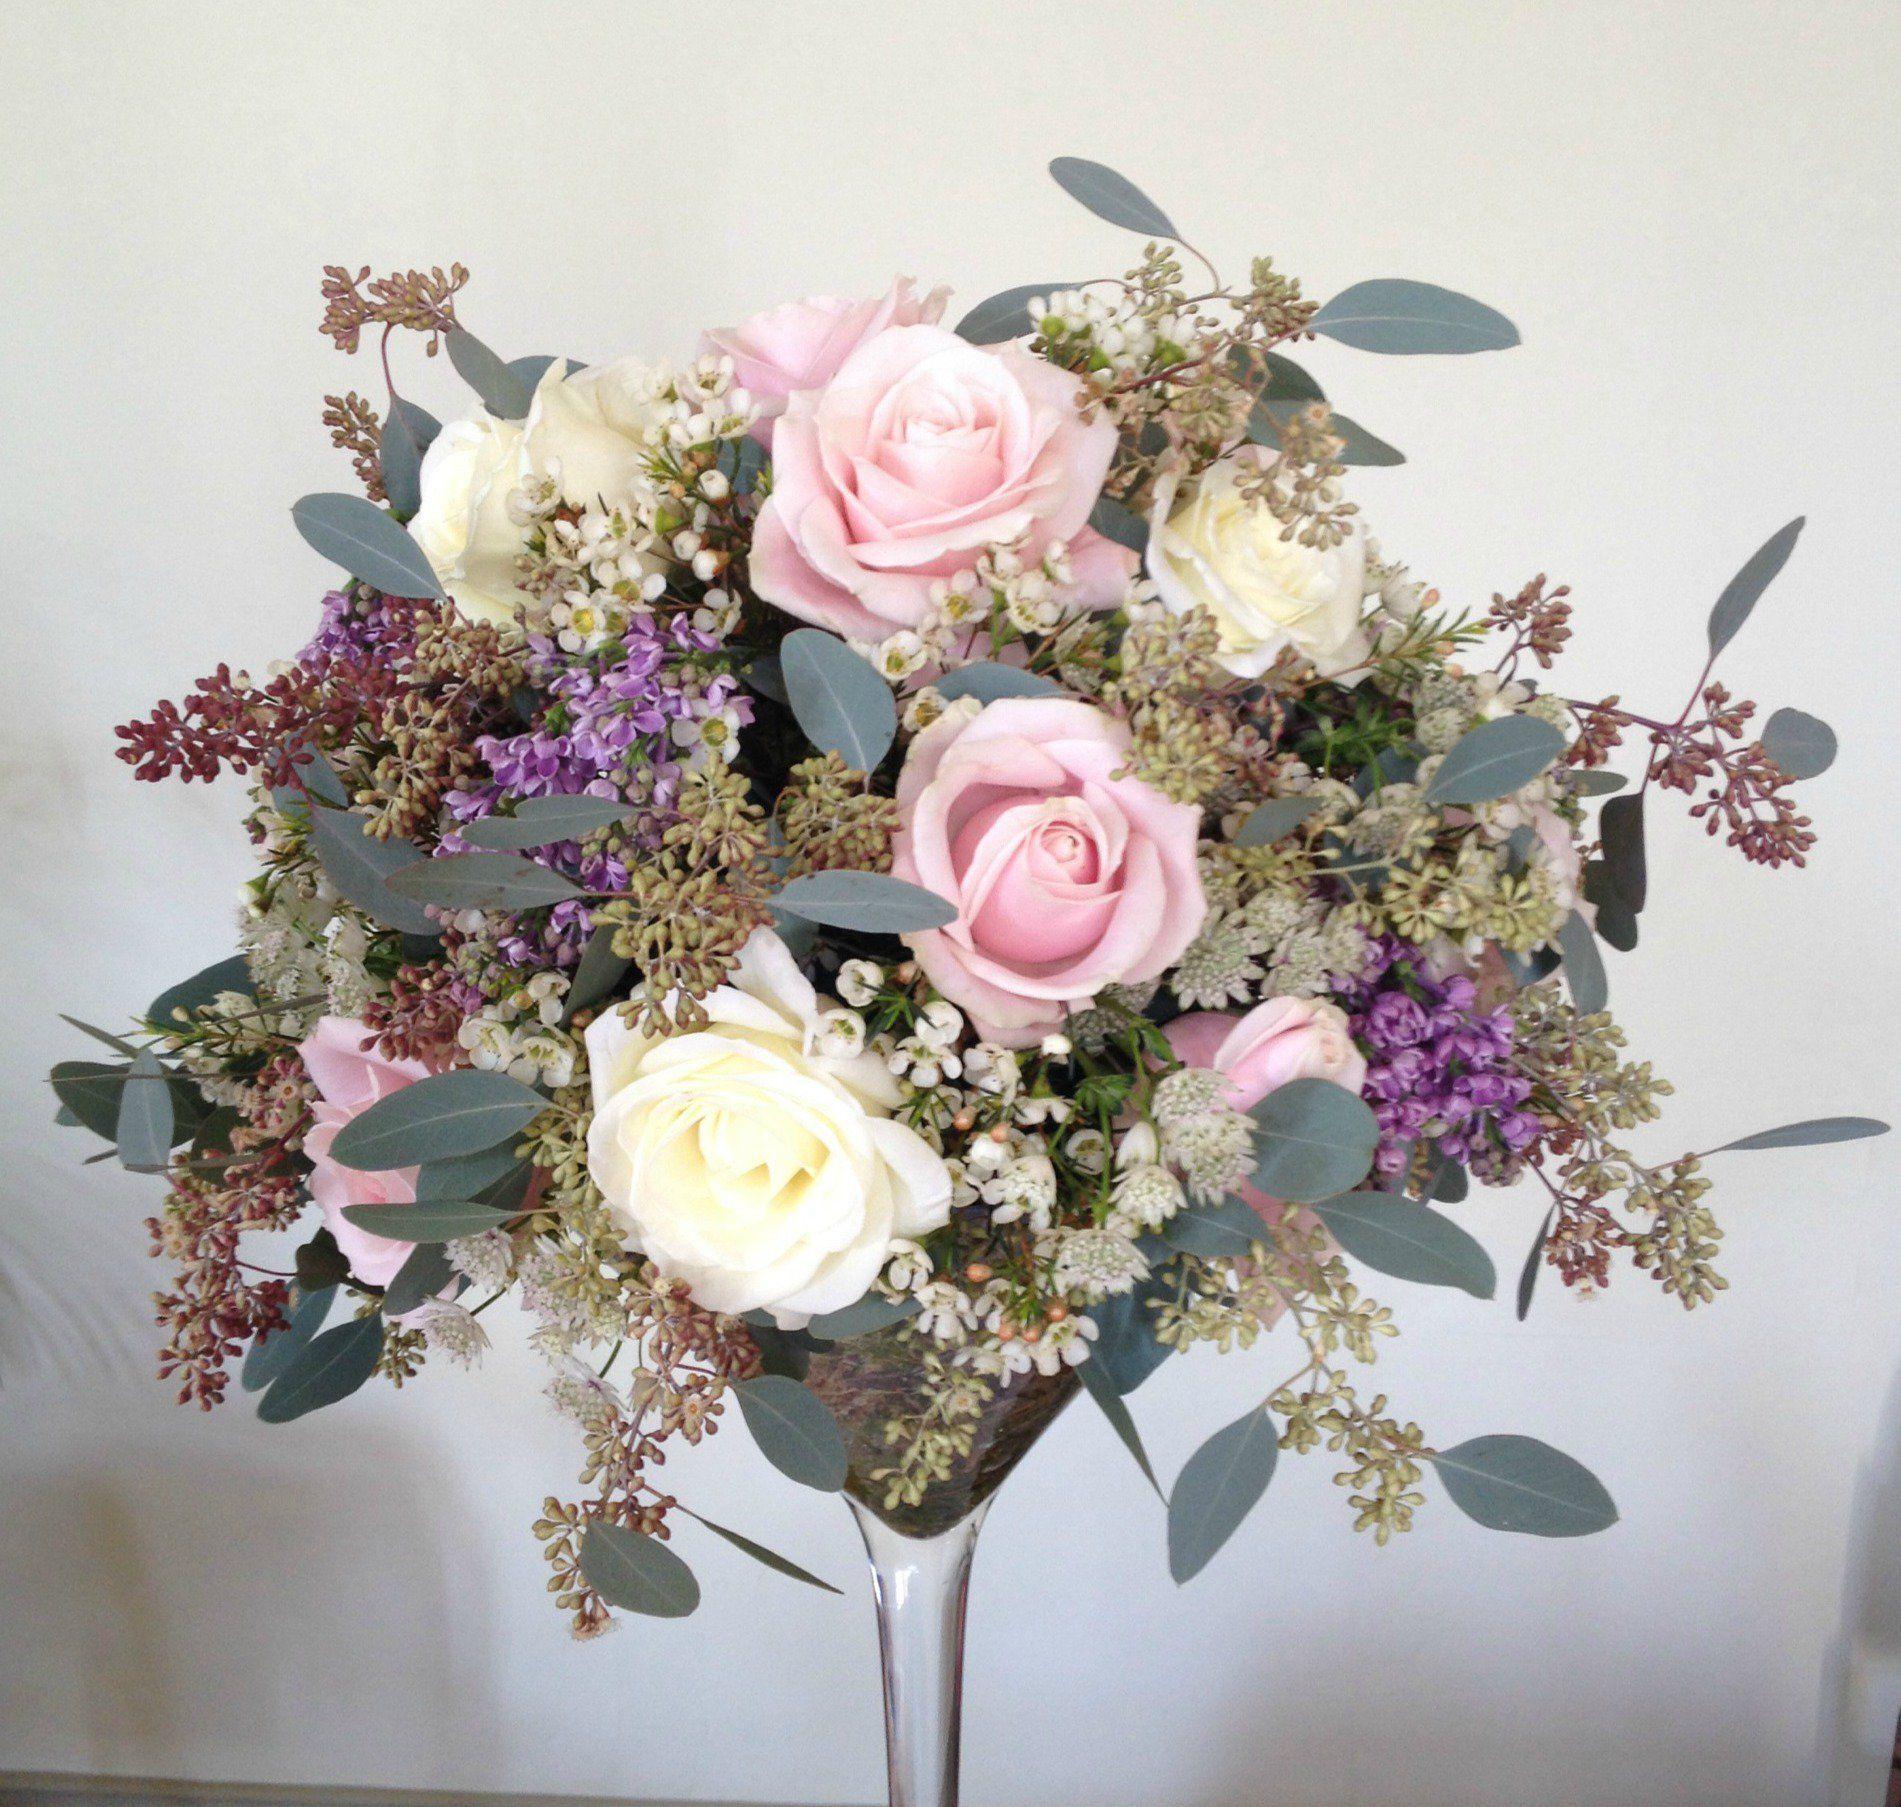 Flower arrange in wine glass high level centrepiece martini flower arrange in wine glass high level centrepiece martini glass arrangement with soft pinks reviewsmspy